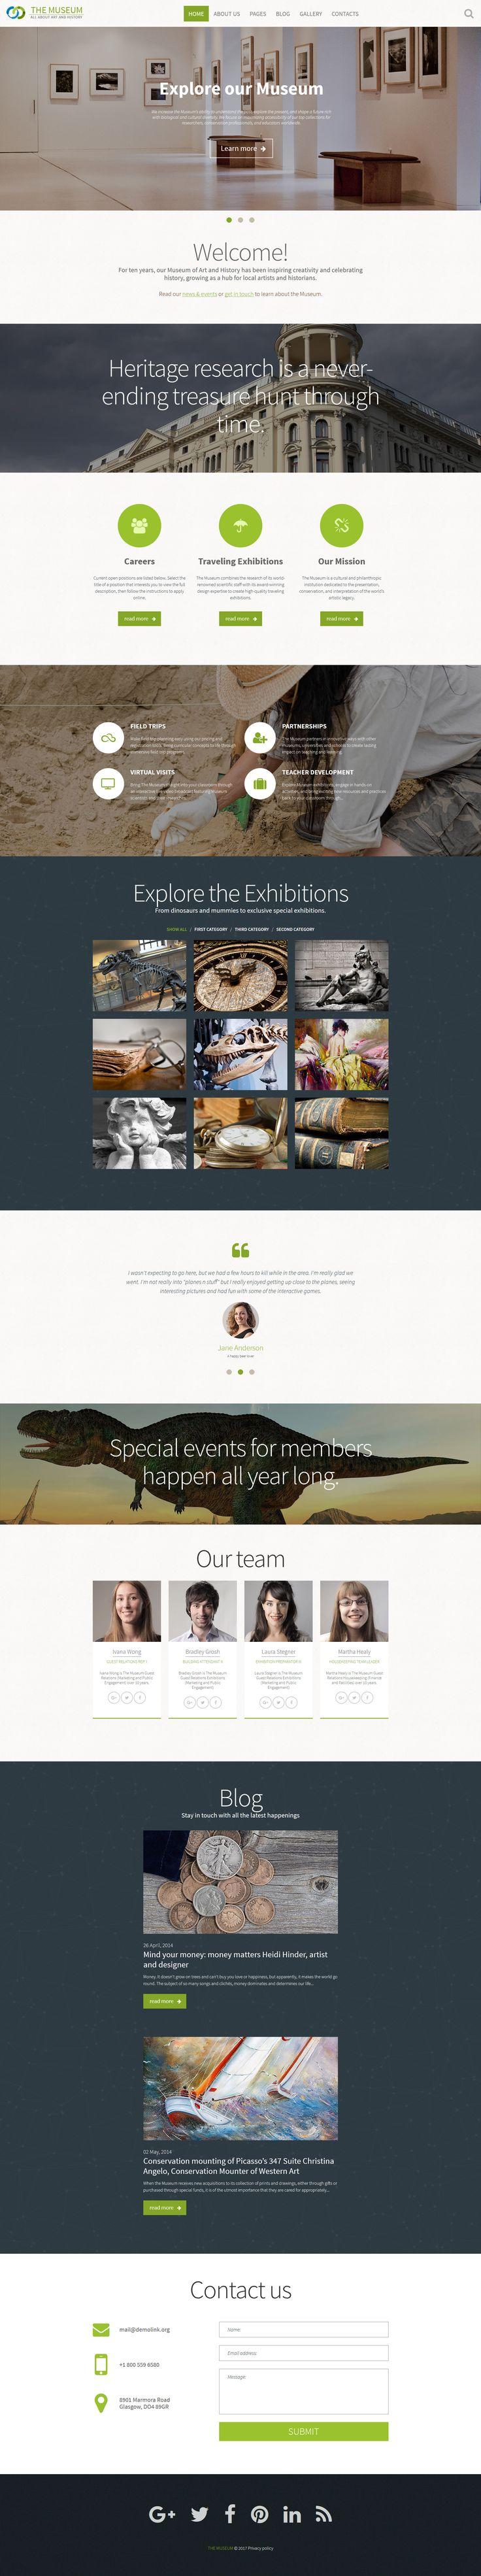 Mejores 311 imágenes de Joomla Templates en Pinterest